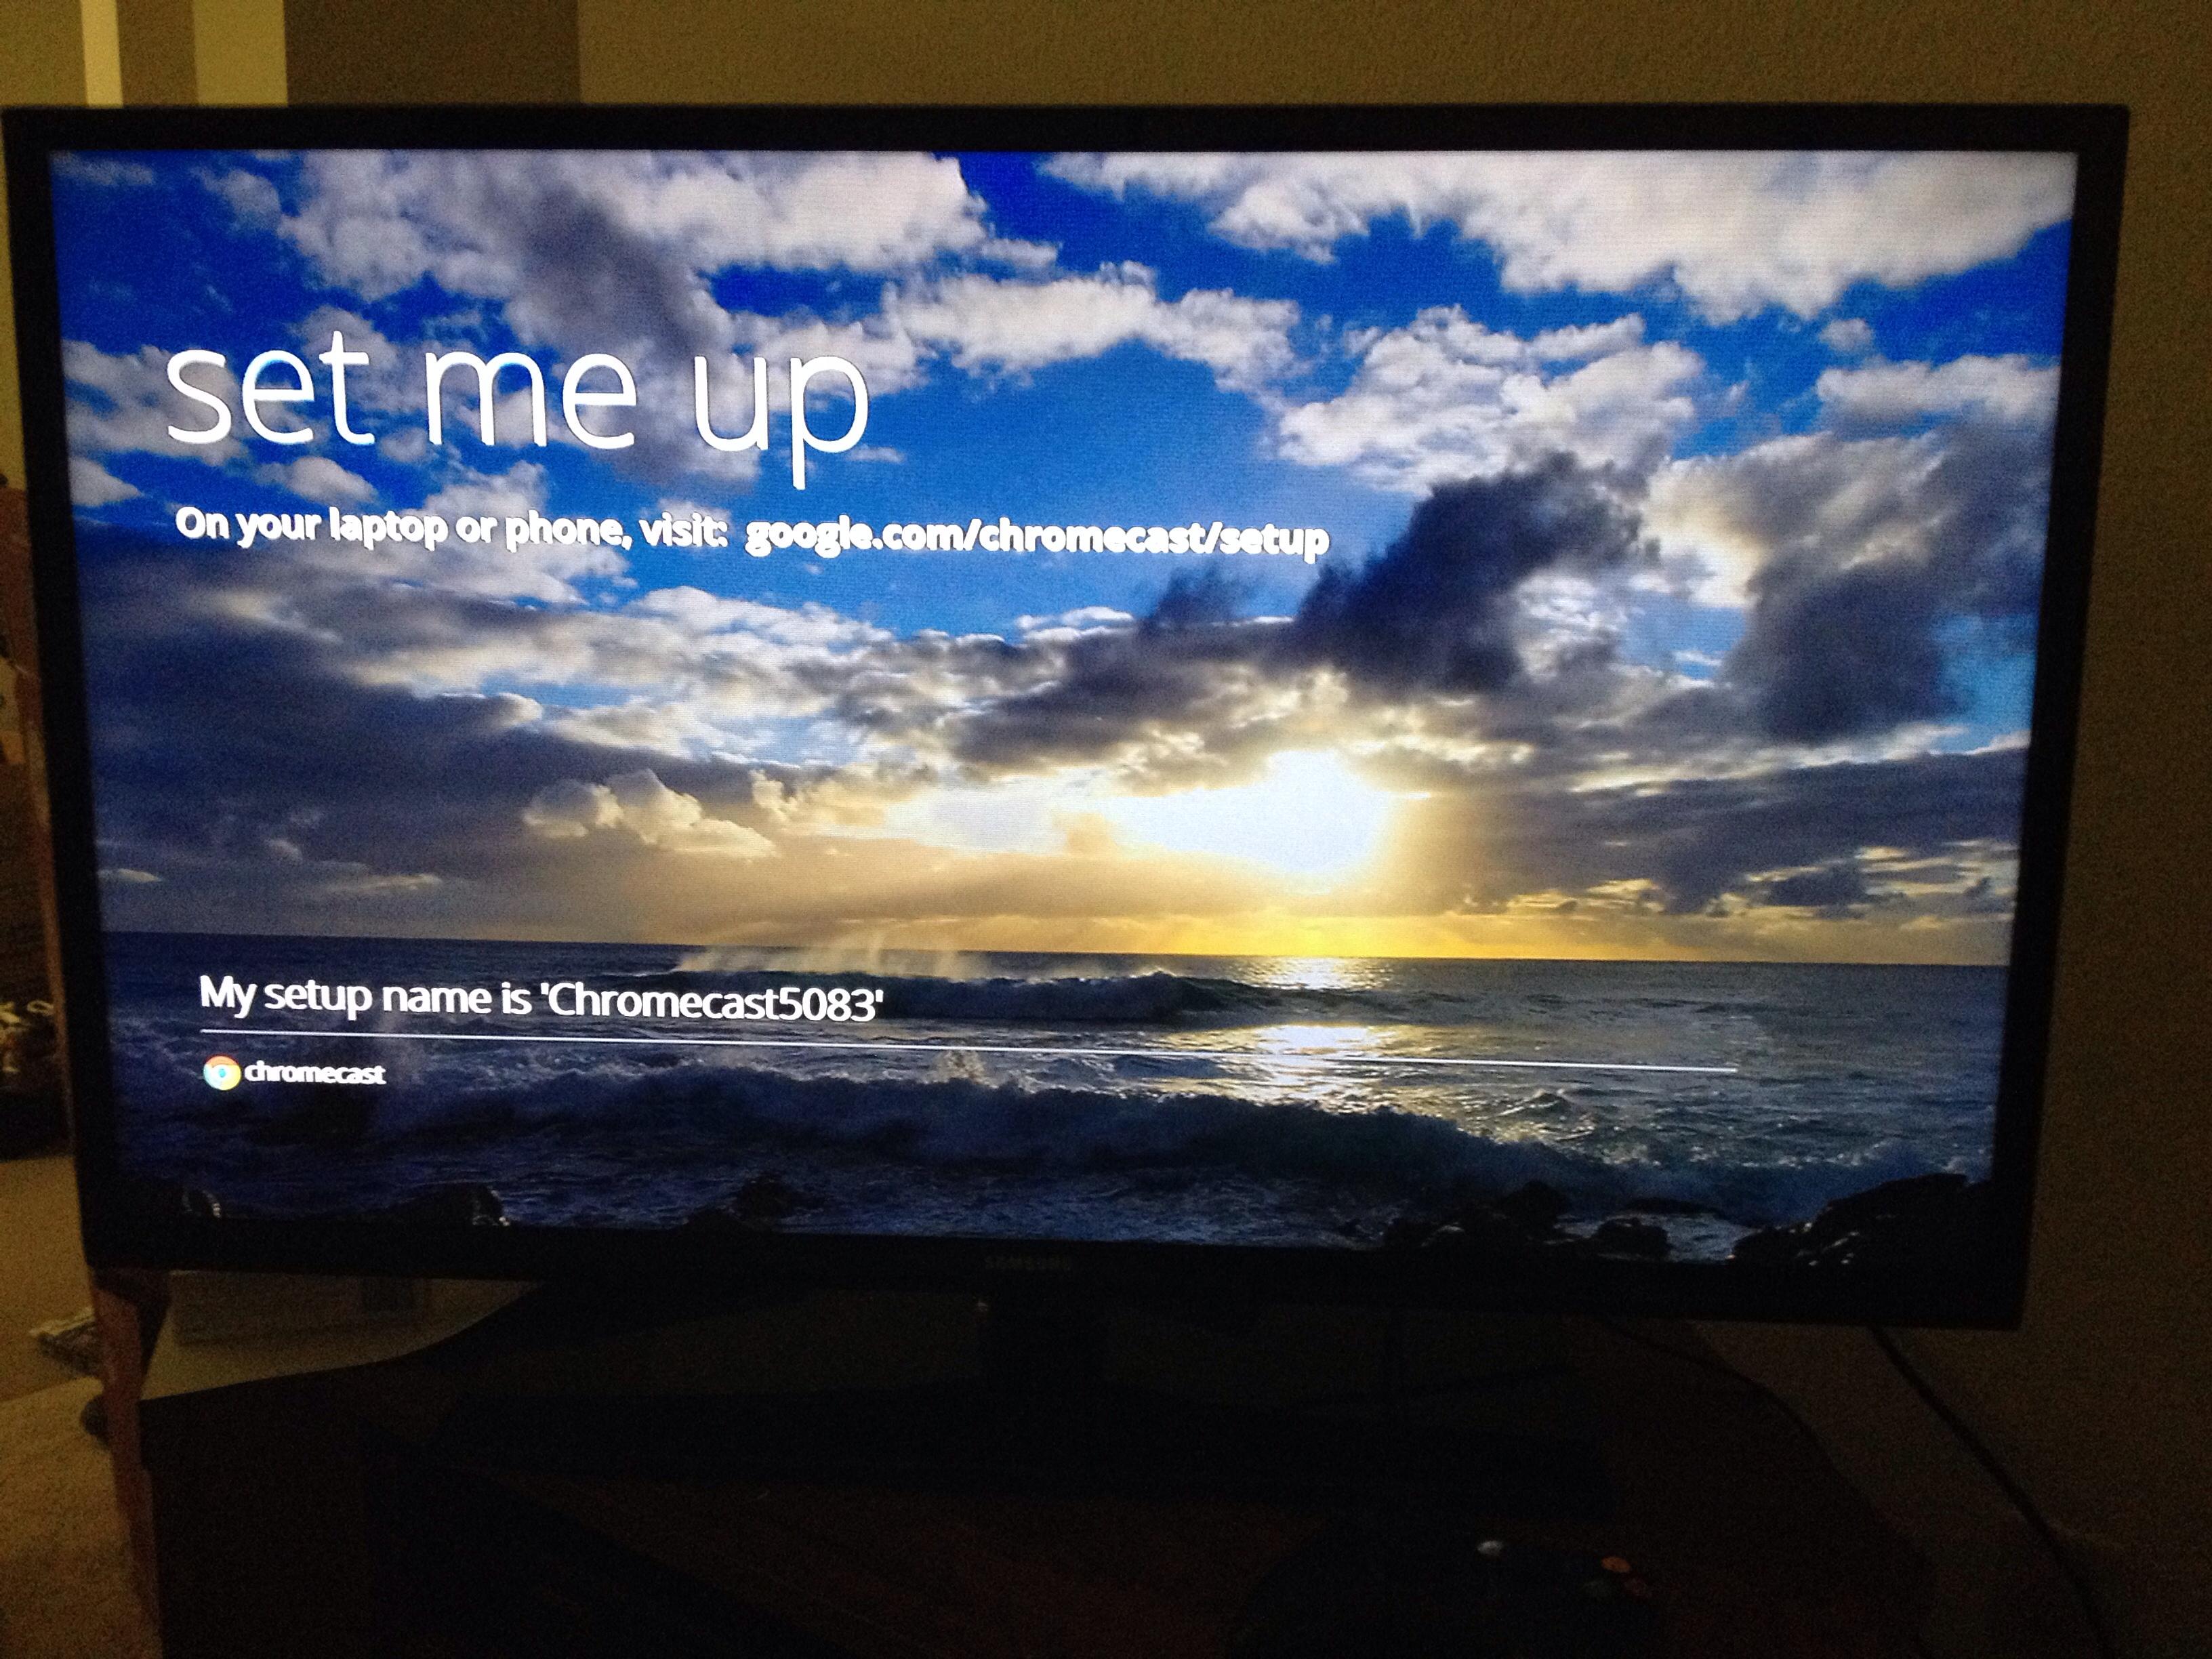 A U Verse Customers Guide To Making Chromecast Work Techgraphs Att Uverse Installation Wiring Ccast